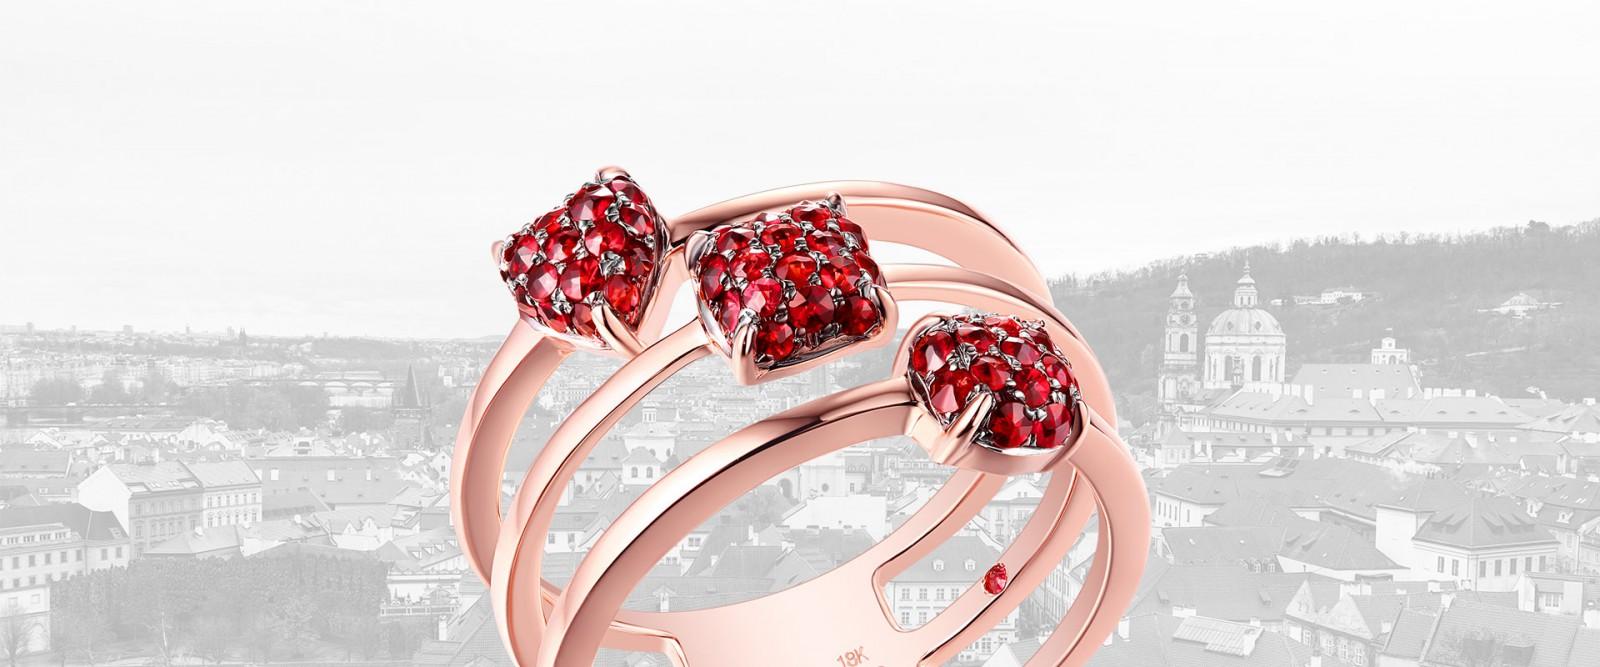 Where to buy Garnet Jewelry in Prague?